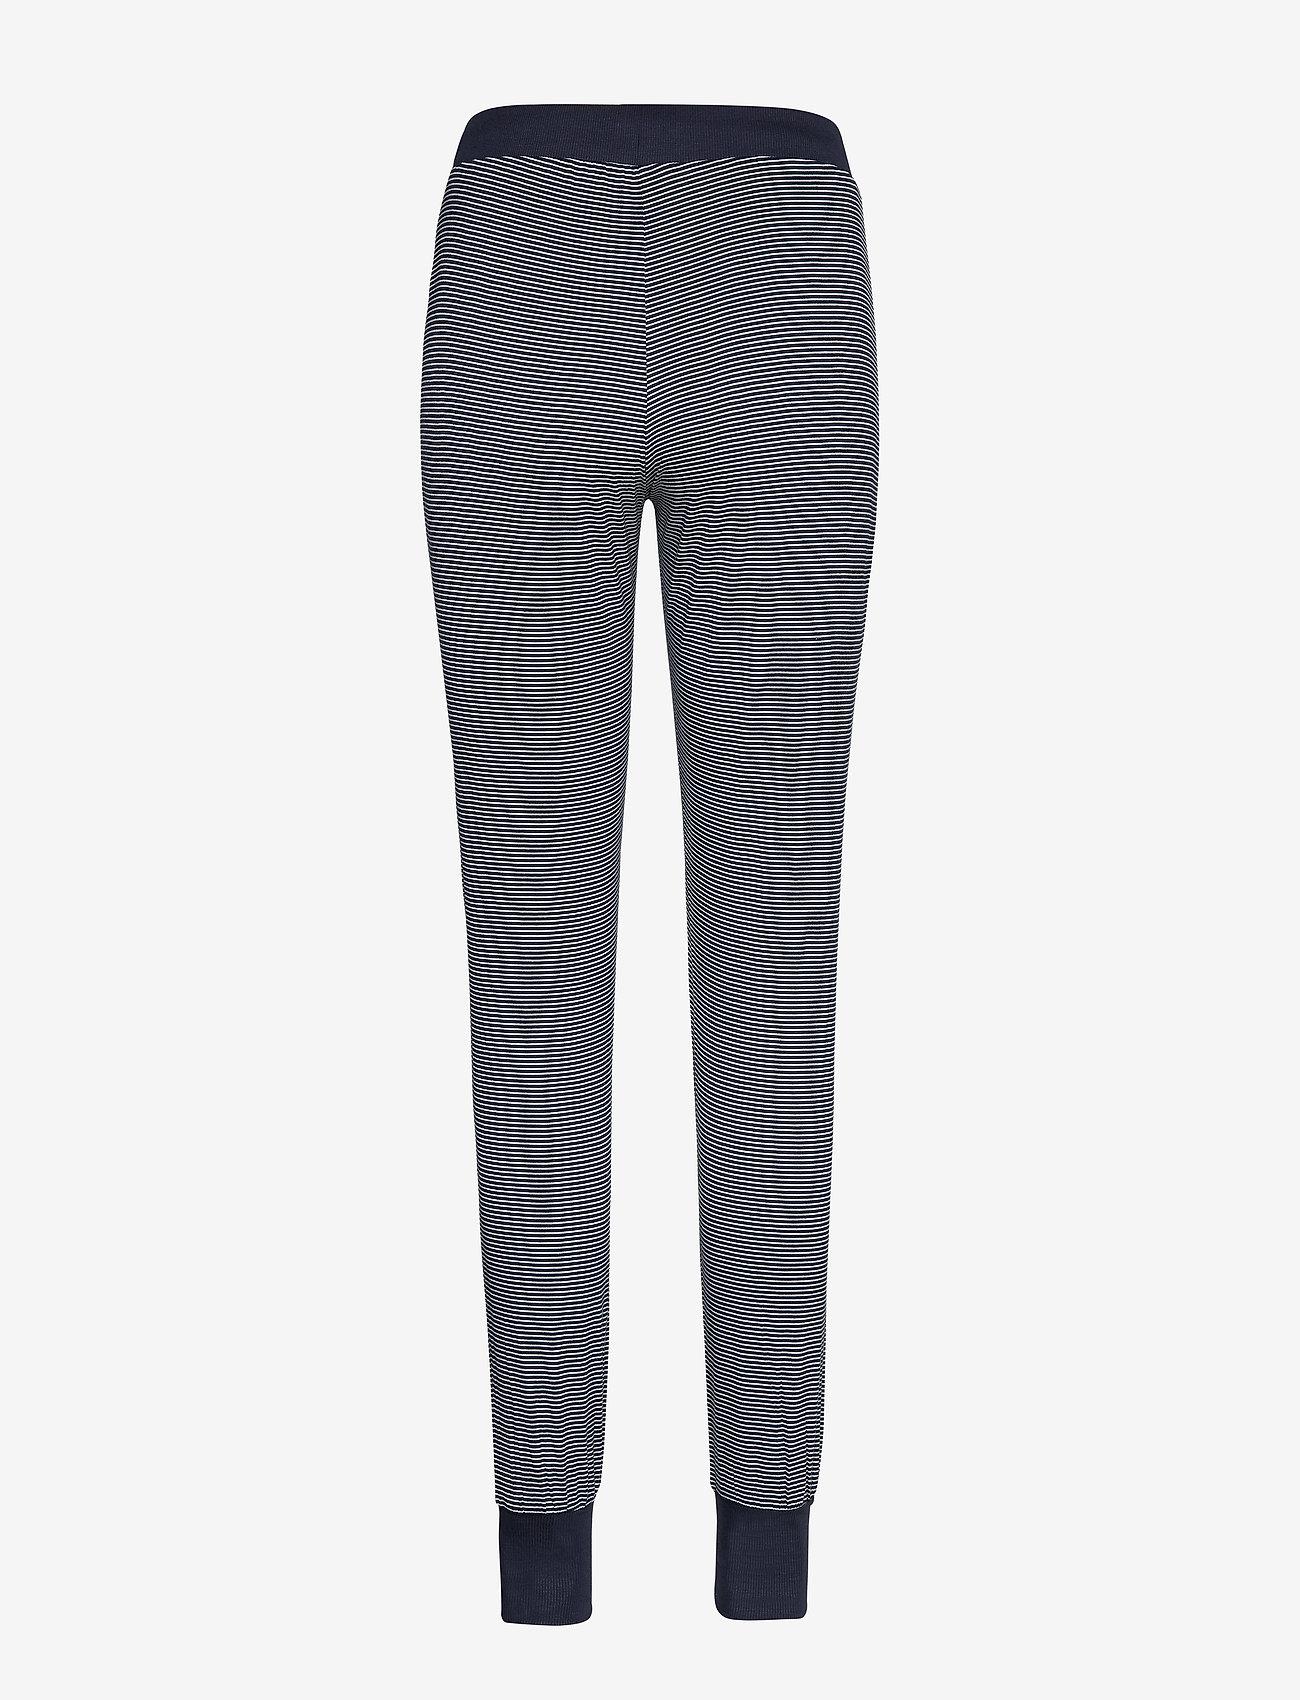 Esprit Bodywear Women - Nightpants - underdele - navy - 1